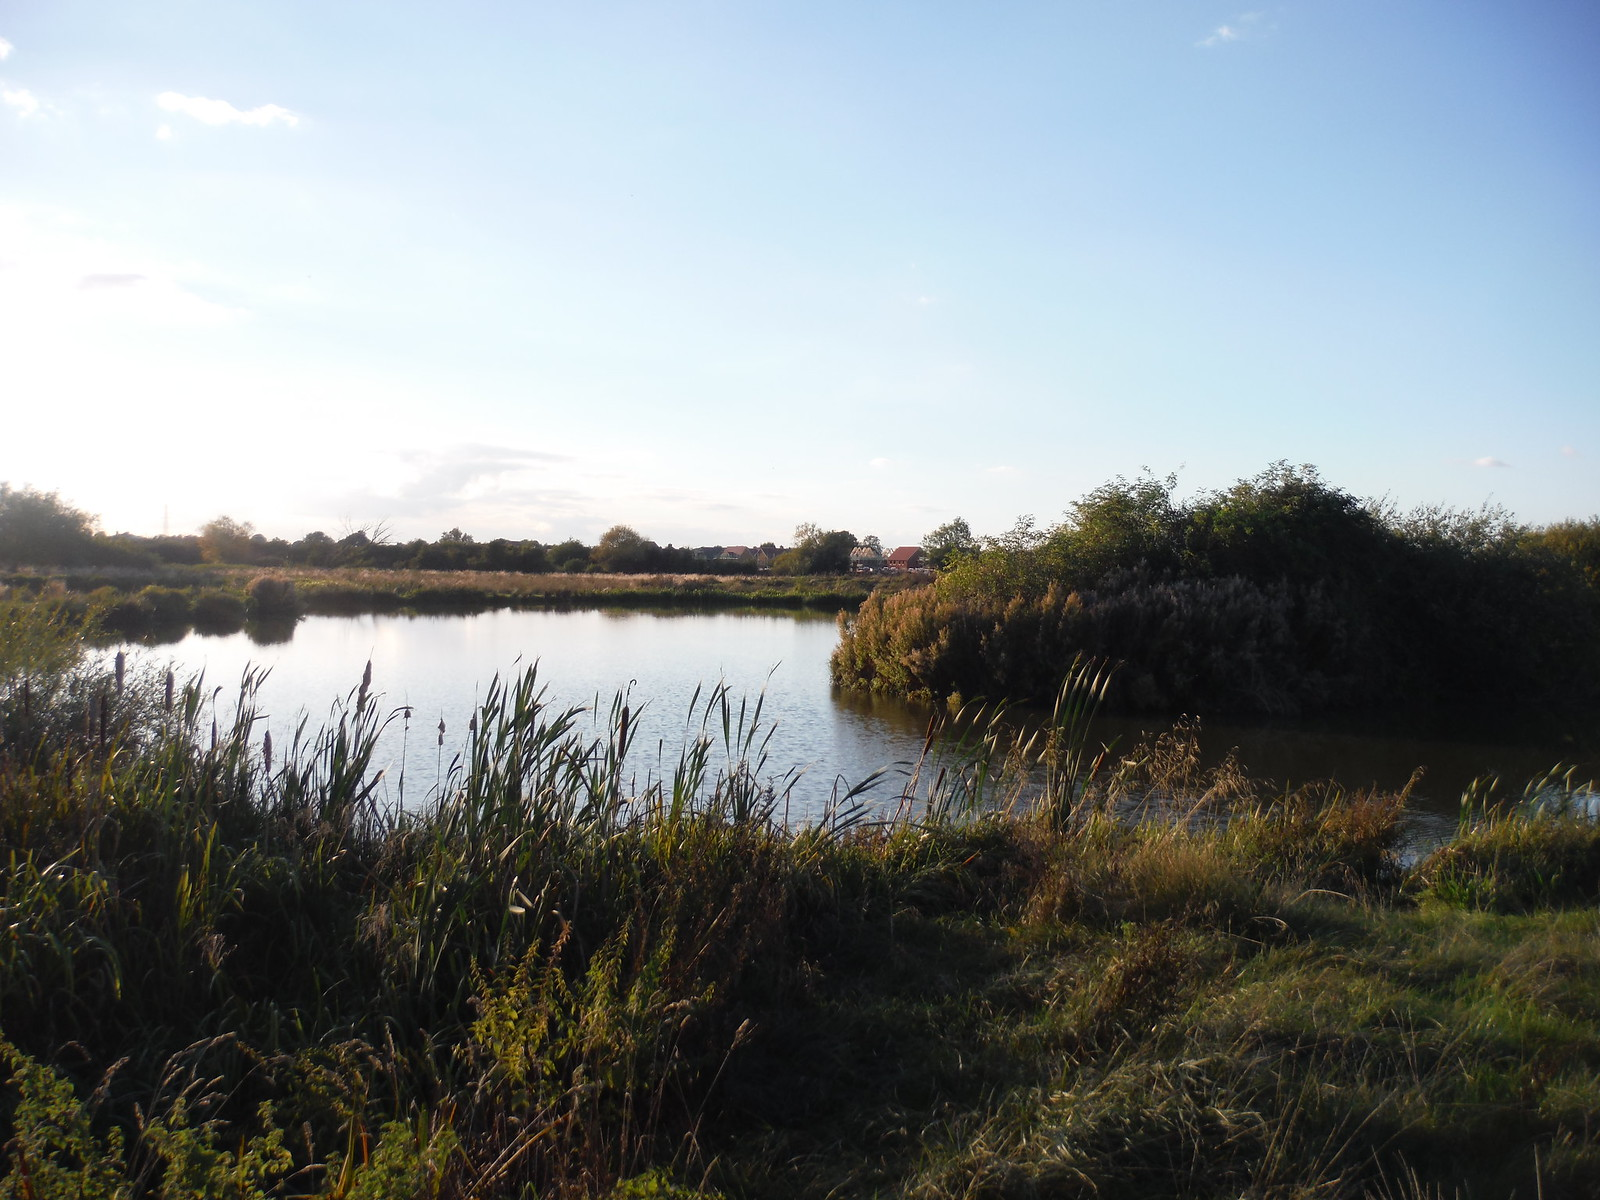 Fishing Pond near Grand Union Canal SWC Walk 194 Aylesbury Vale Parkway to Aylesbury